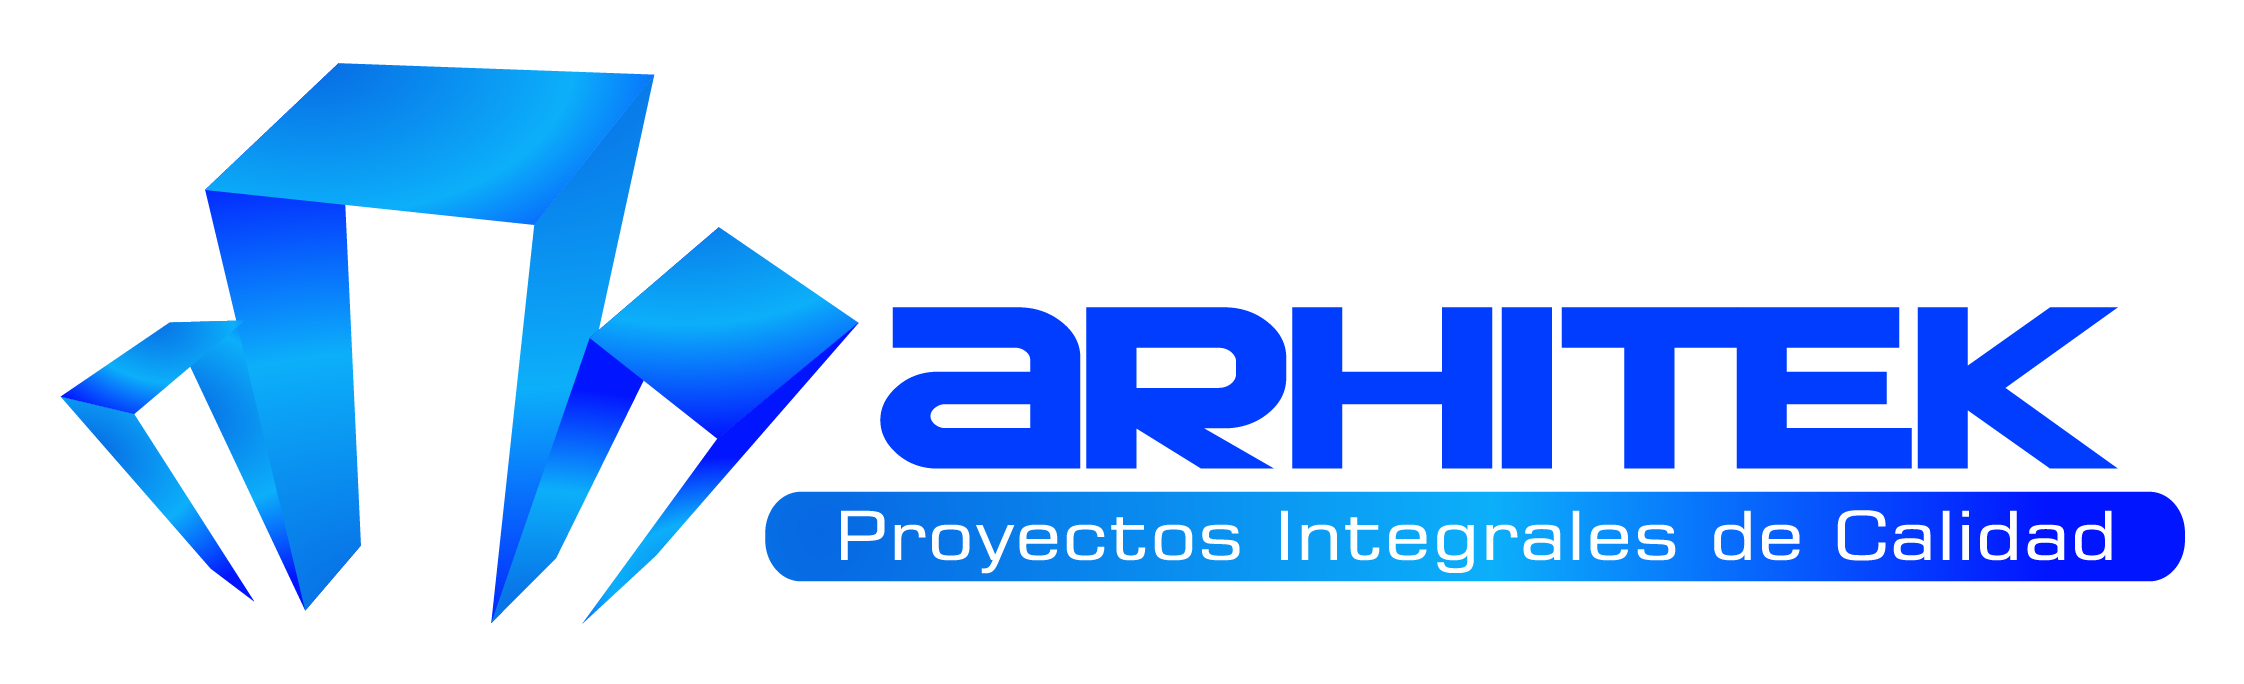 Rl Proyectos Integrales